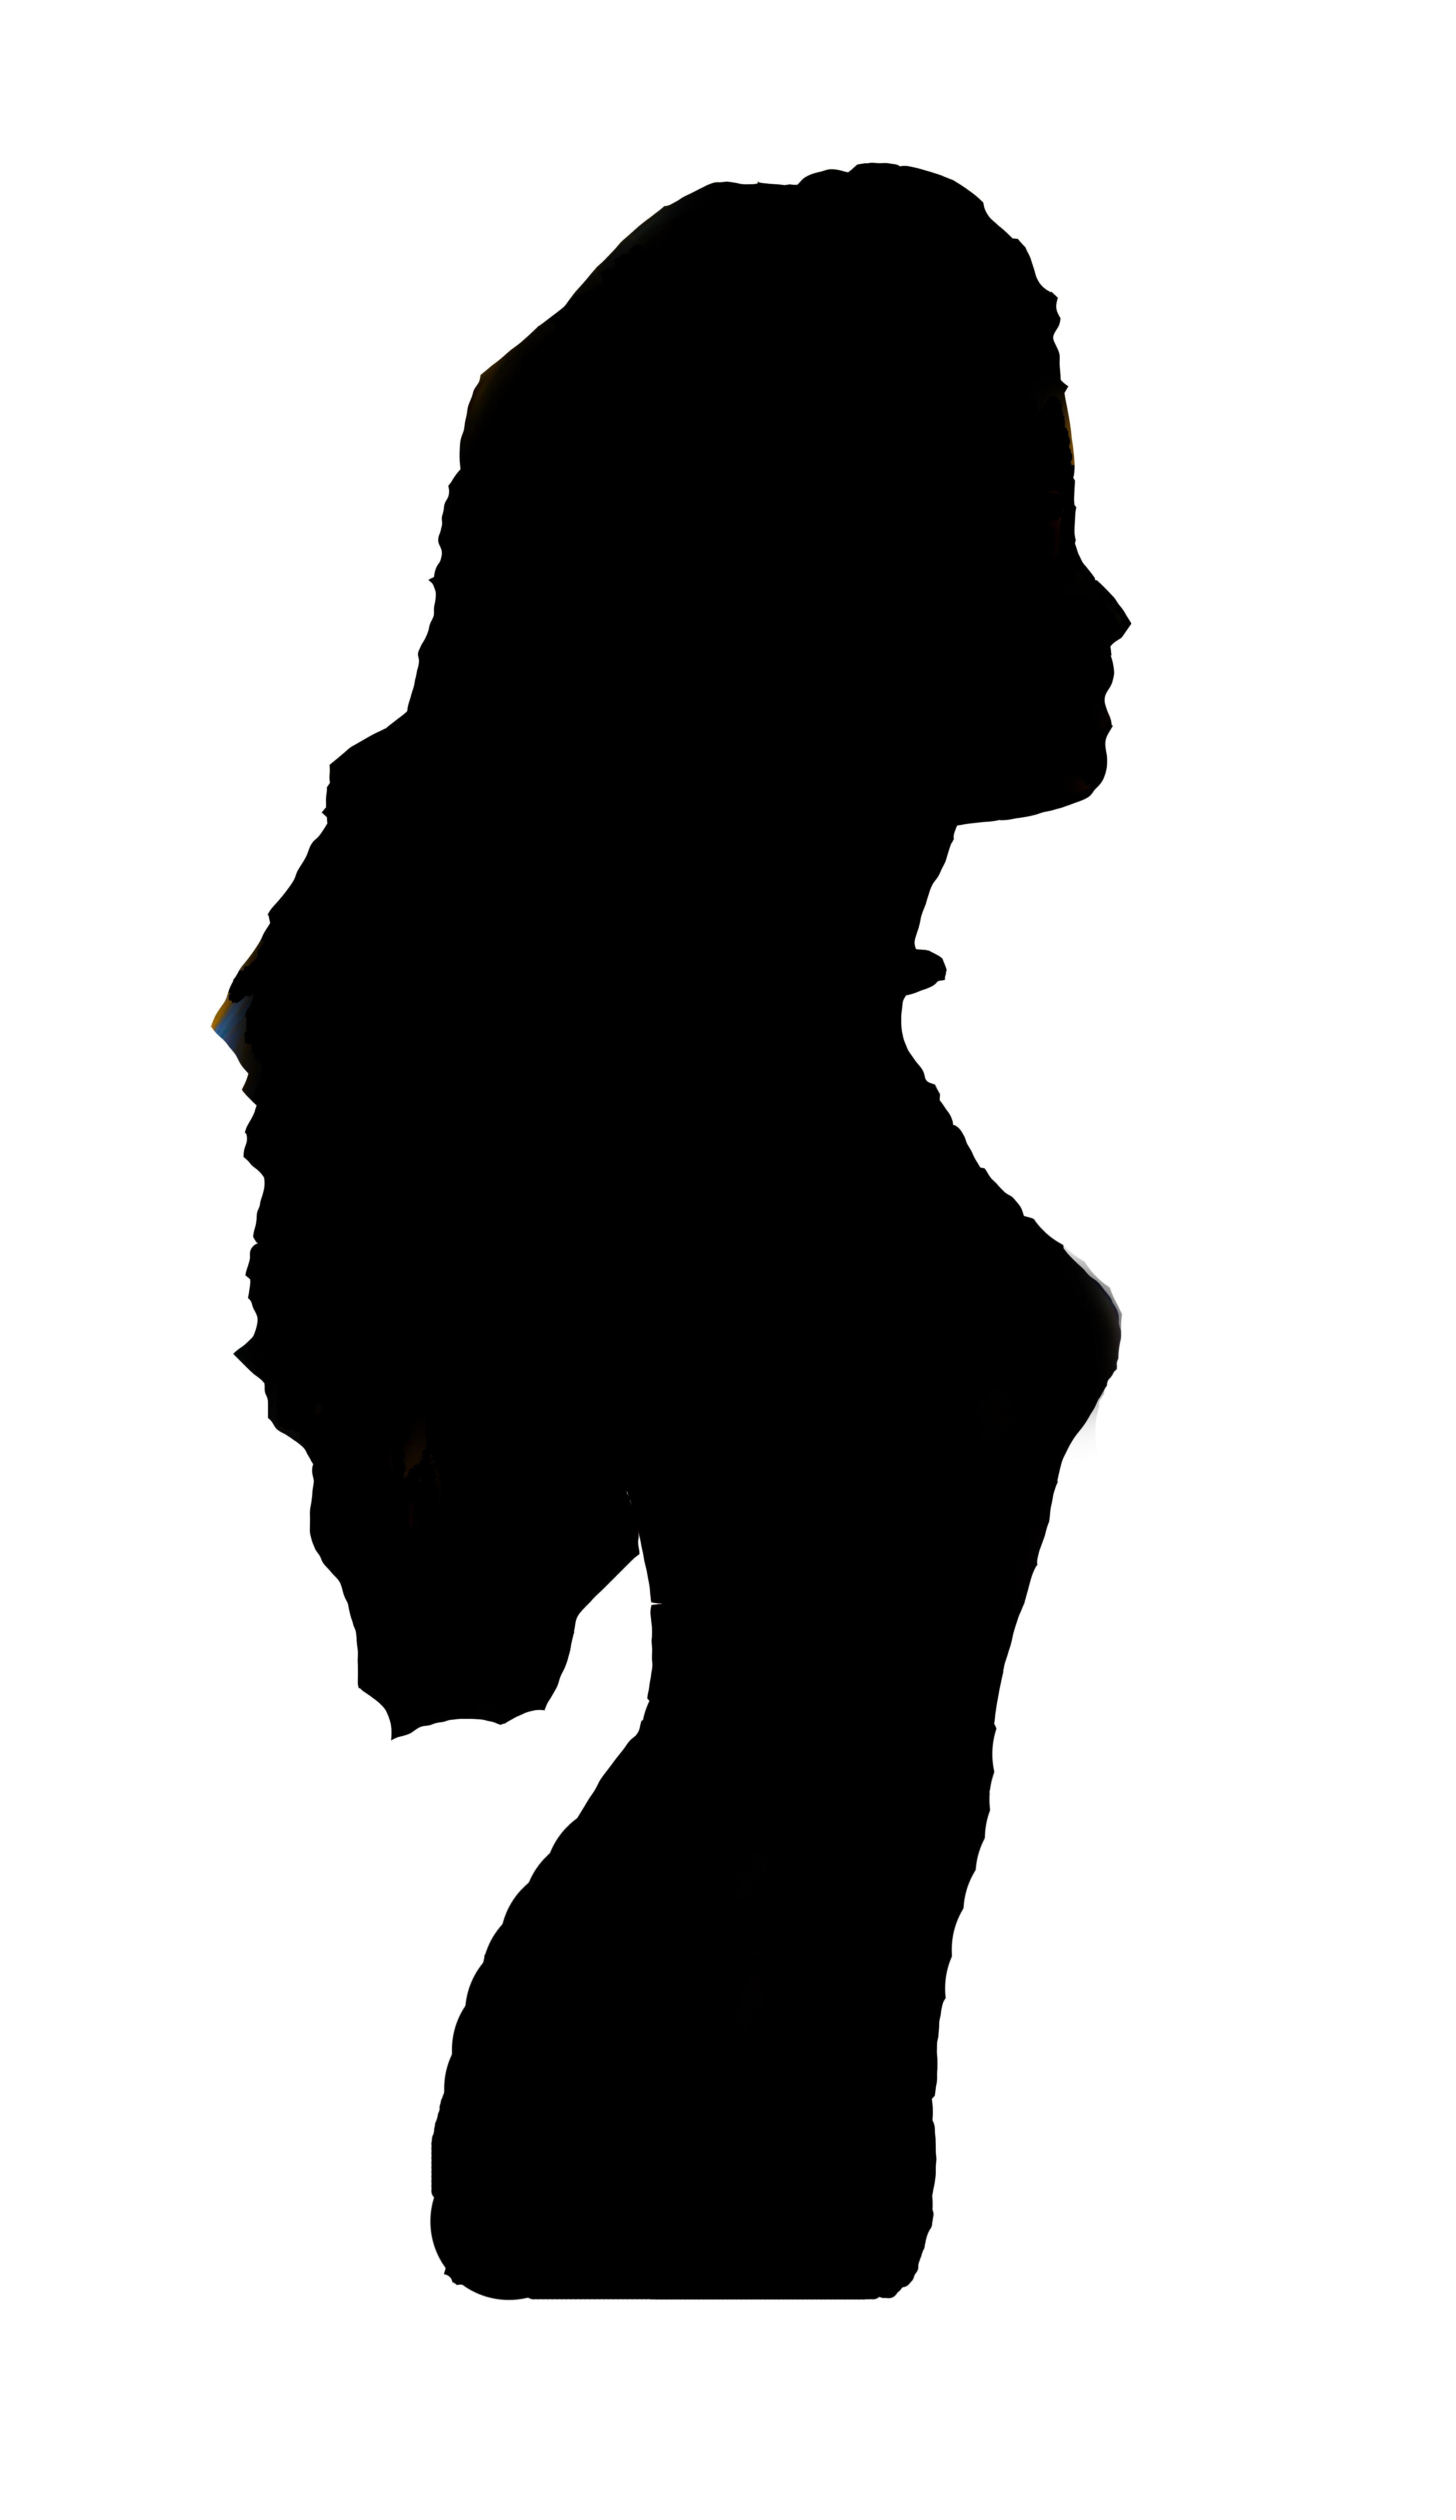 3336x5772 1354 Opposite Directive Silhouette Barbie Pamandbarbz